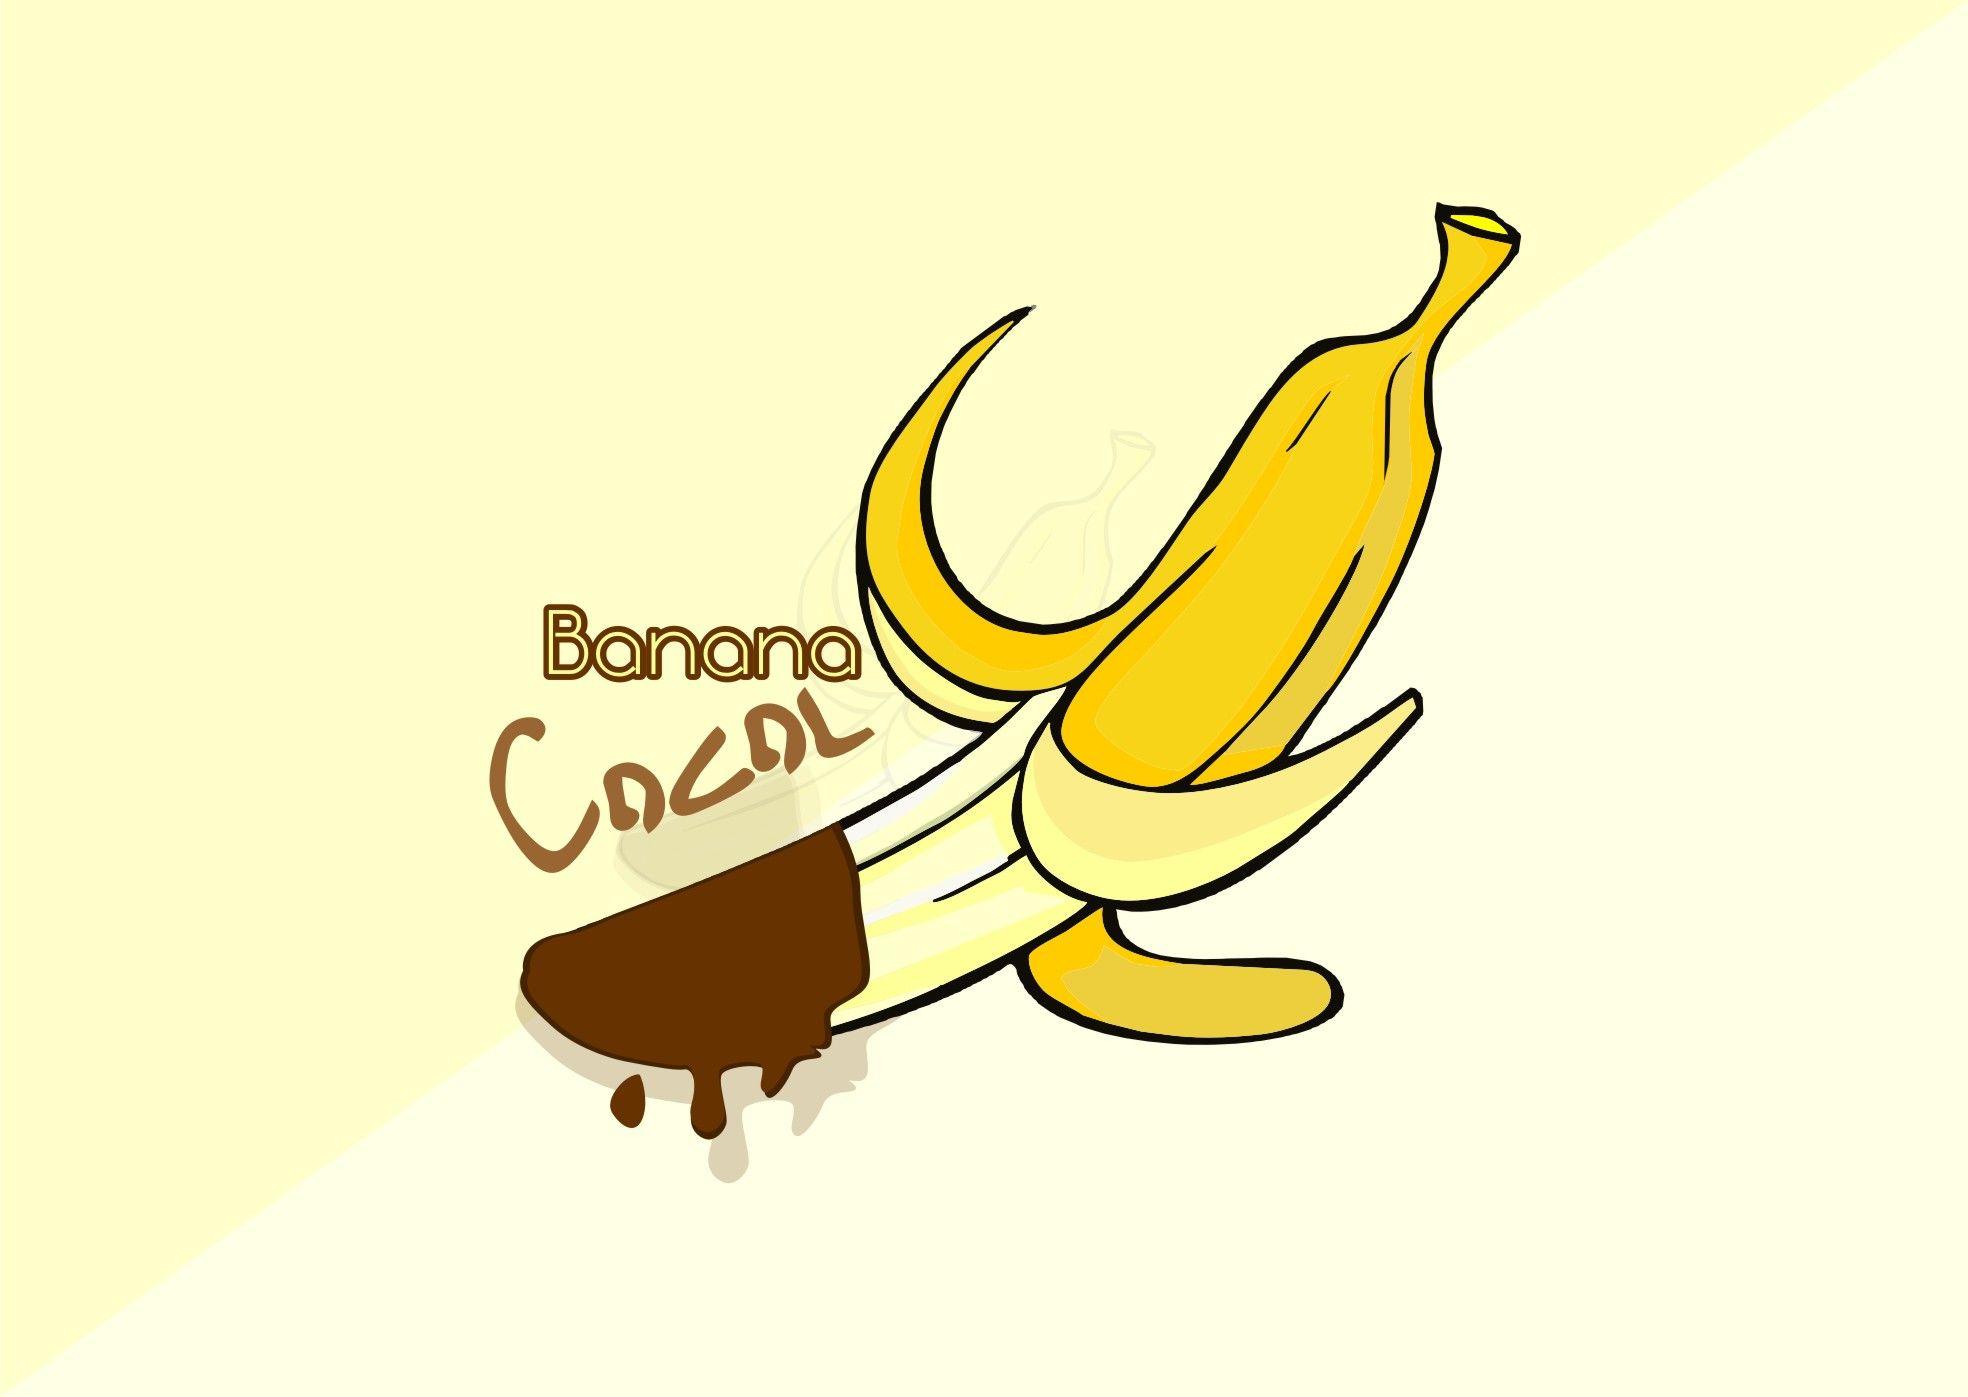 logo banana coklat gambar pisang logo banana coklat gambar pisang